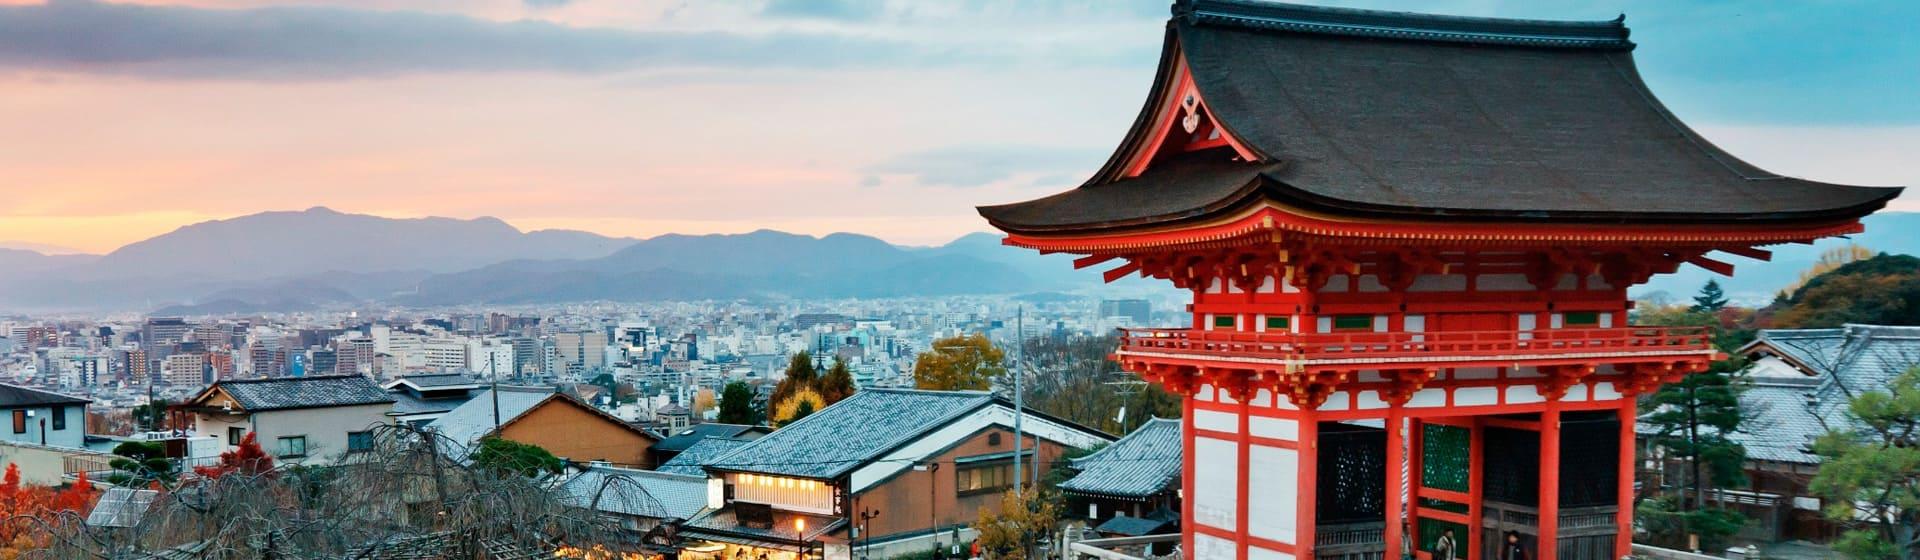 Япония - Банданы